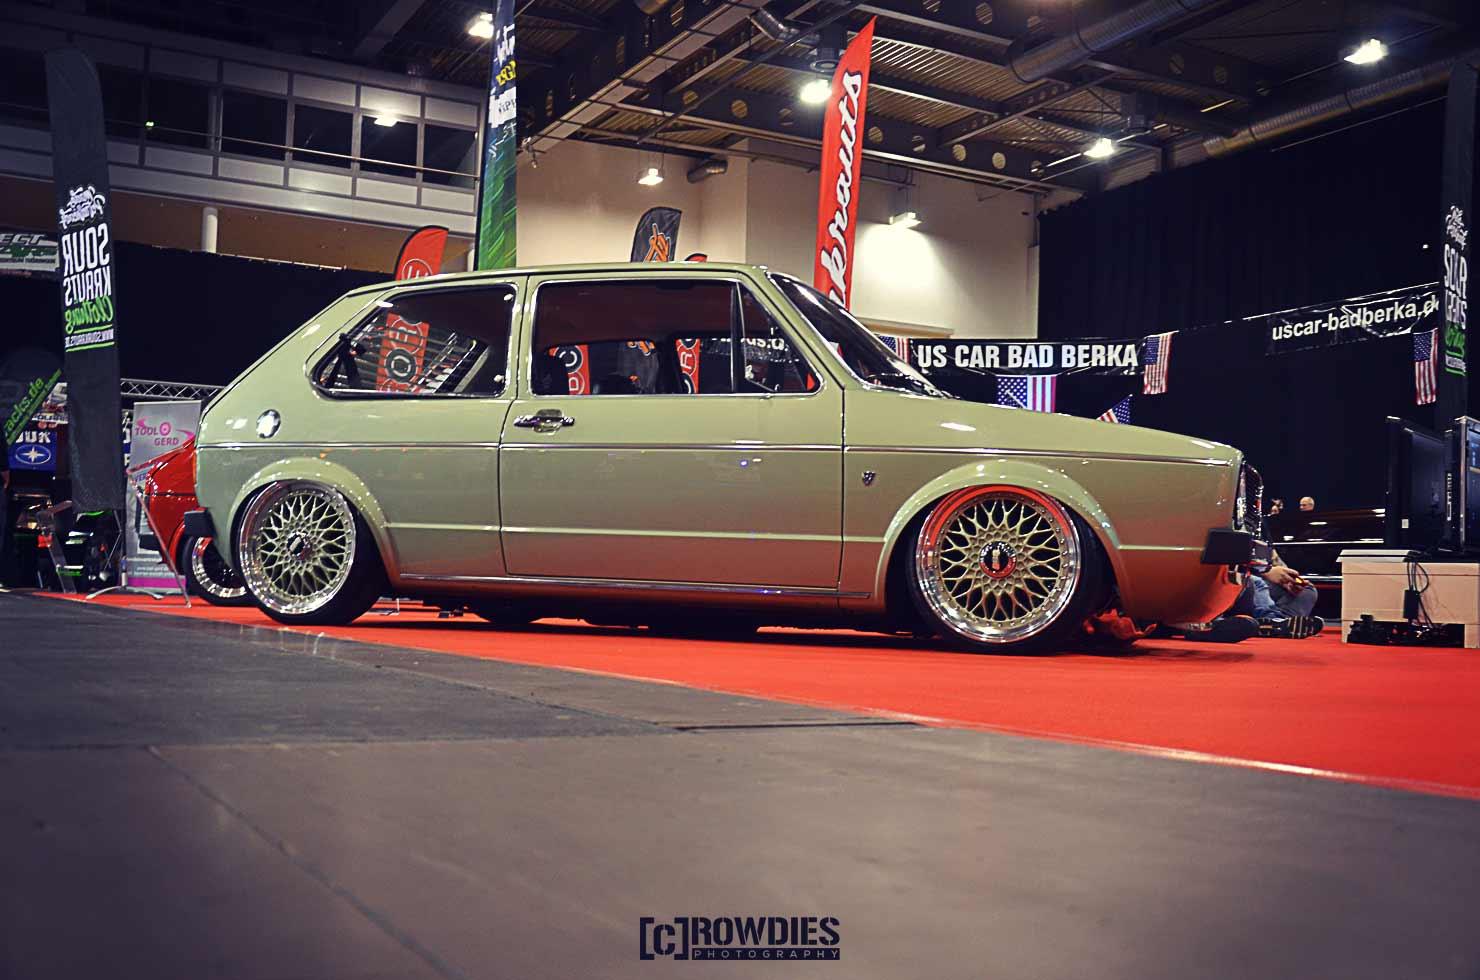 Automobil Messe Erfurt - Sourkrauts Golf 1